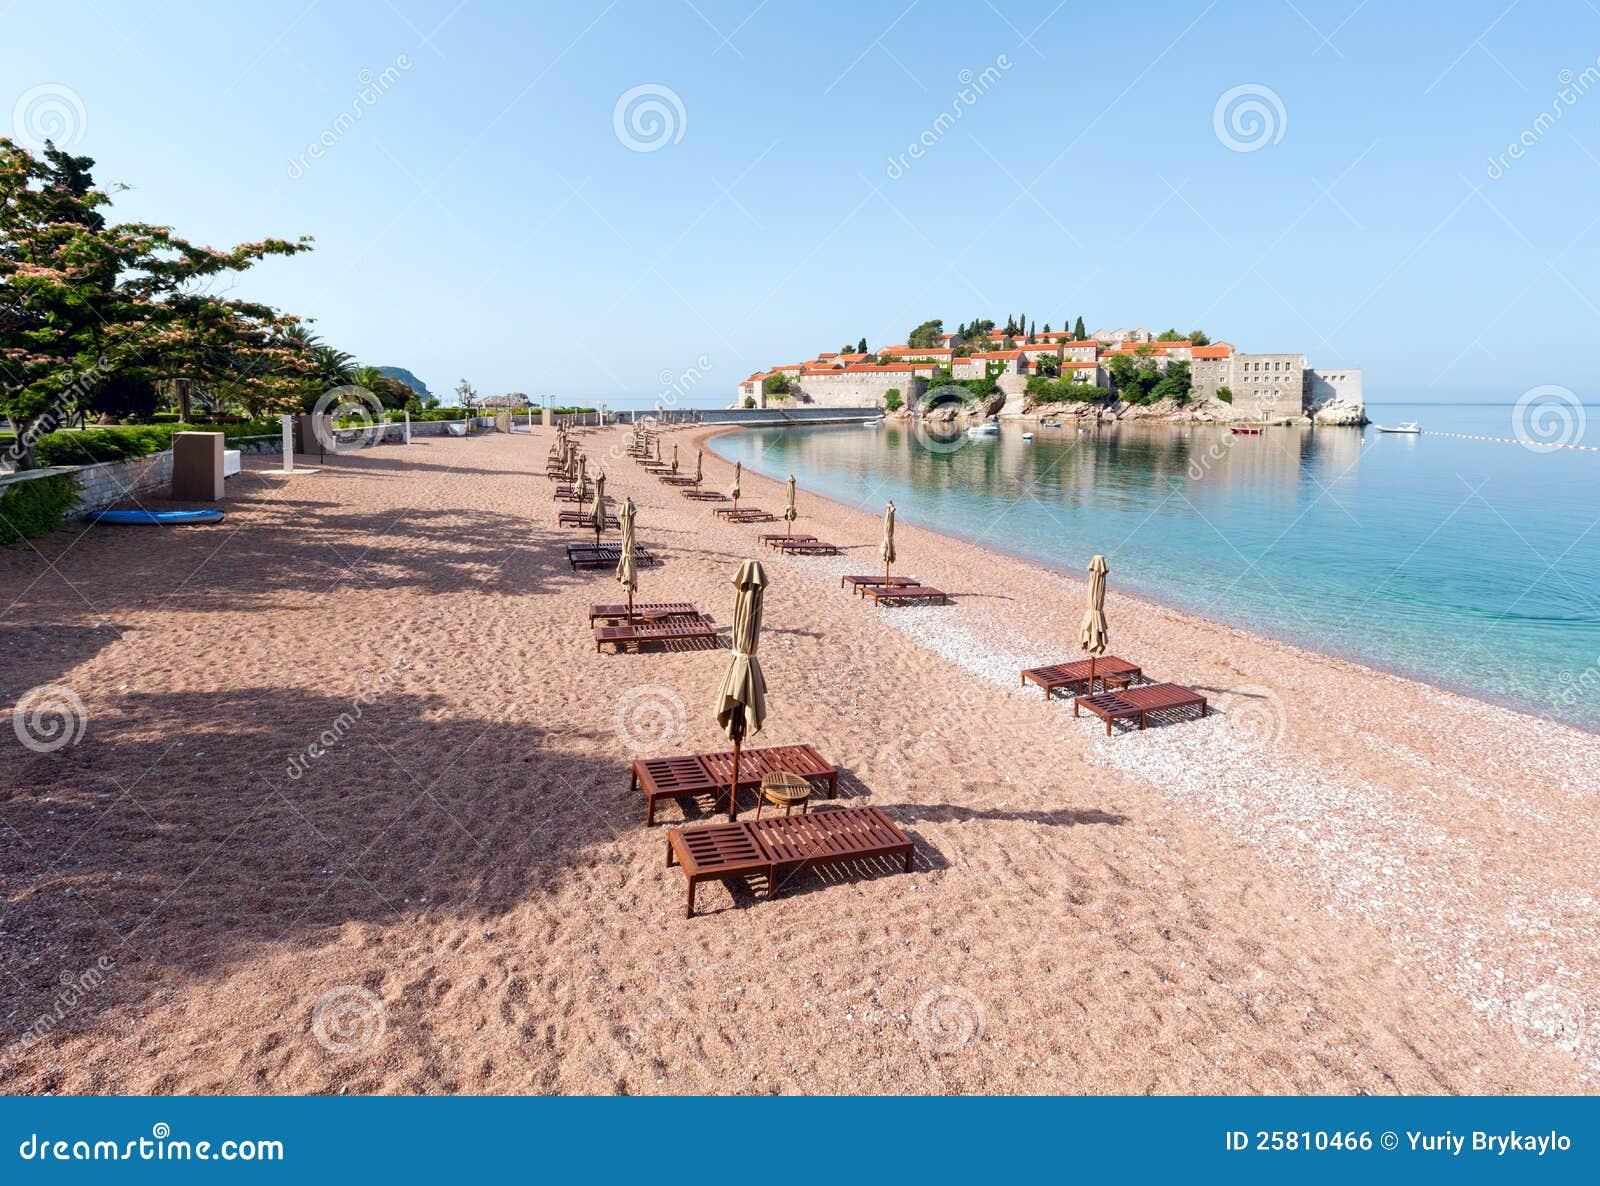 Sveti Stefan Sea Islet And BeachMontenegro Stock Photo Image of